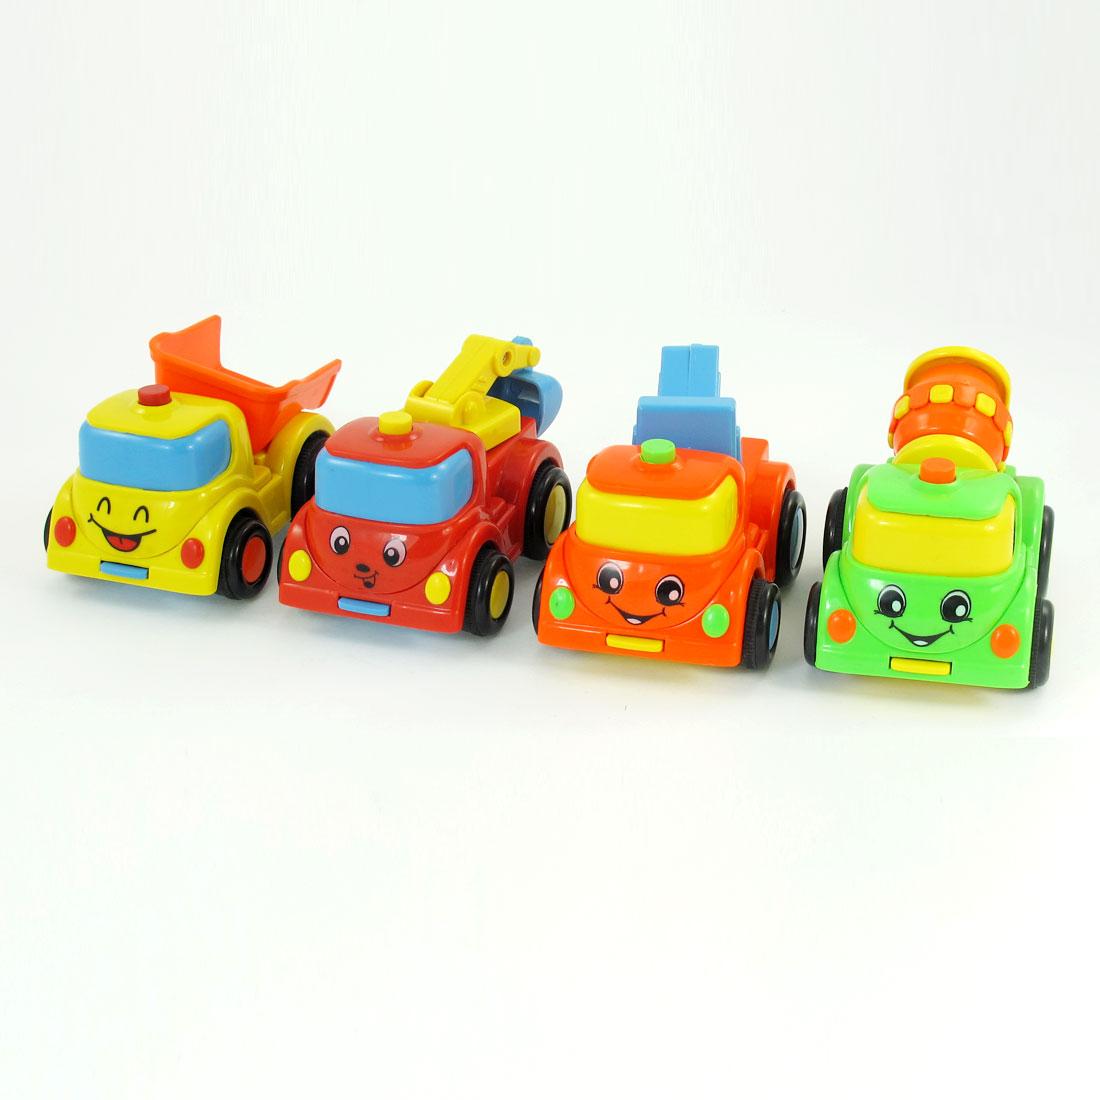 4 Pcs Green Orange Red Cement Mixer Hoist Crane Truck Model Toy for Kids